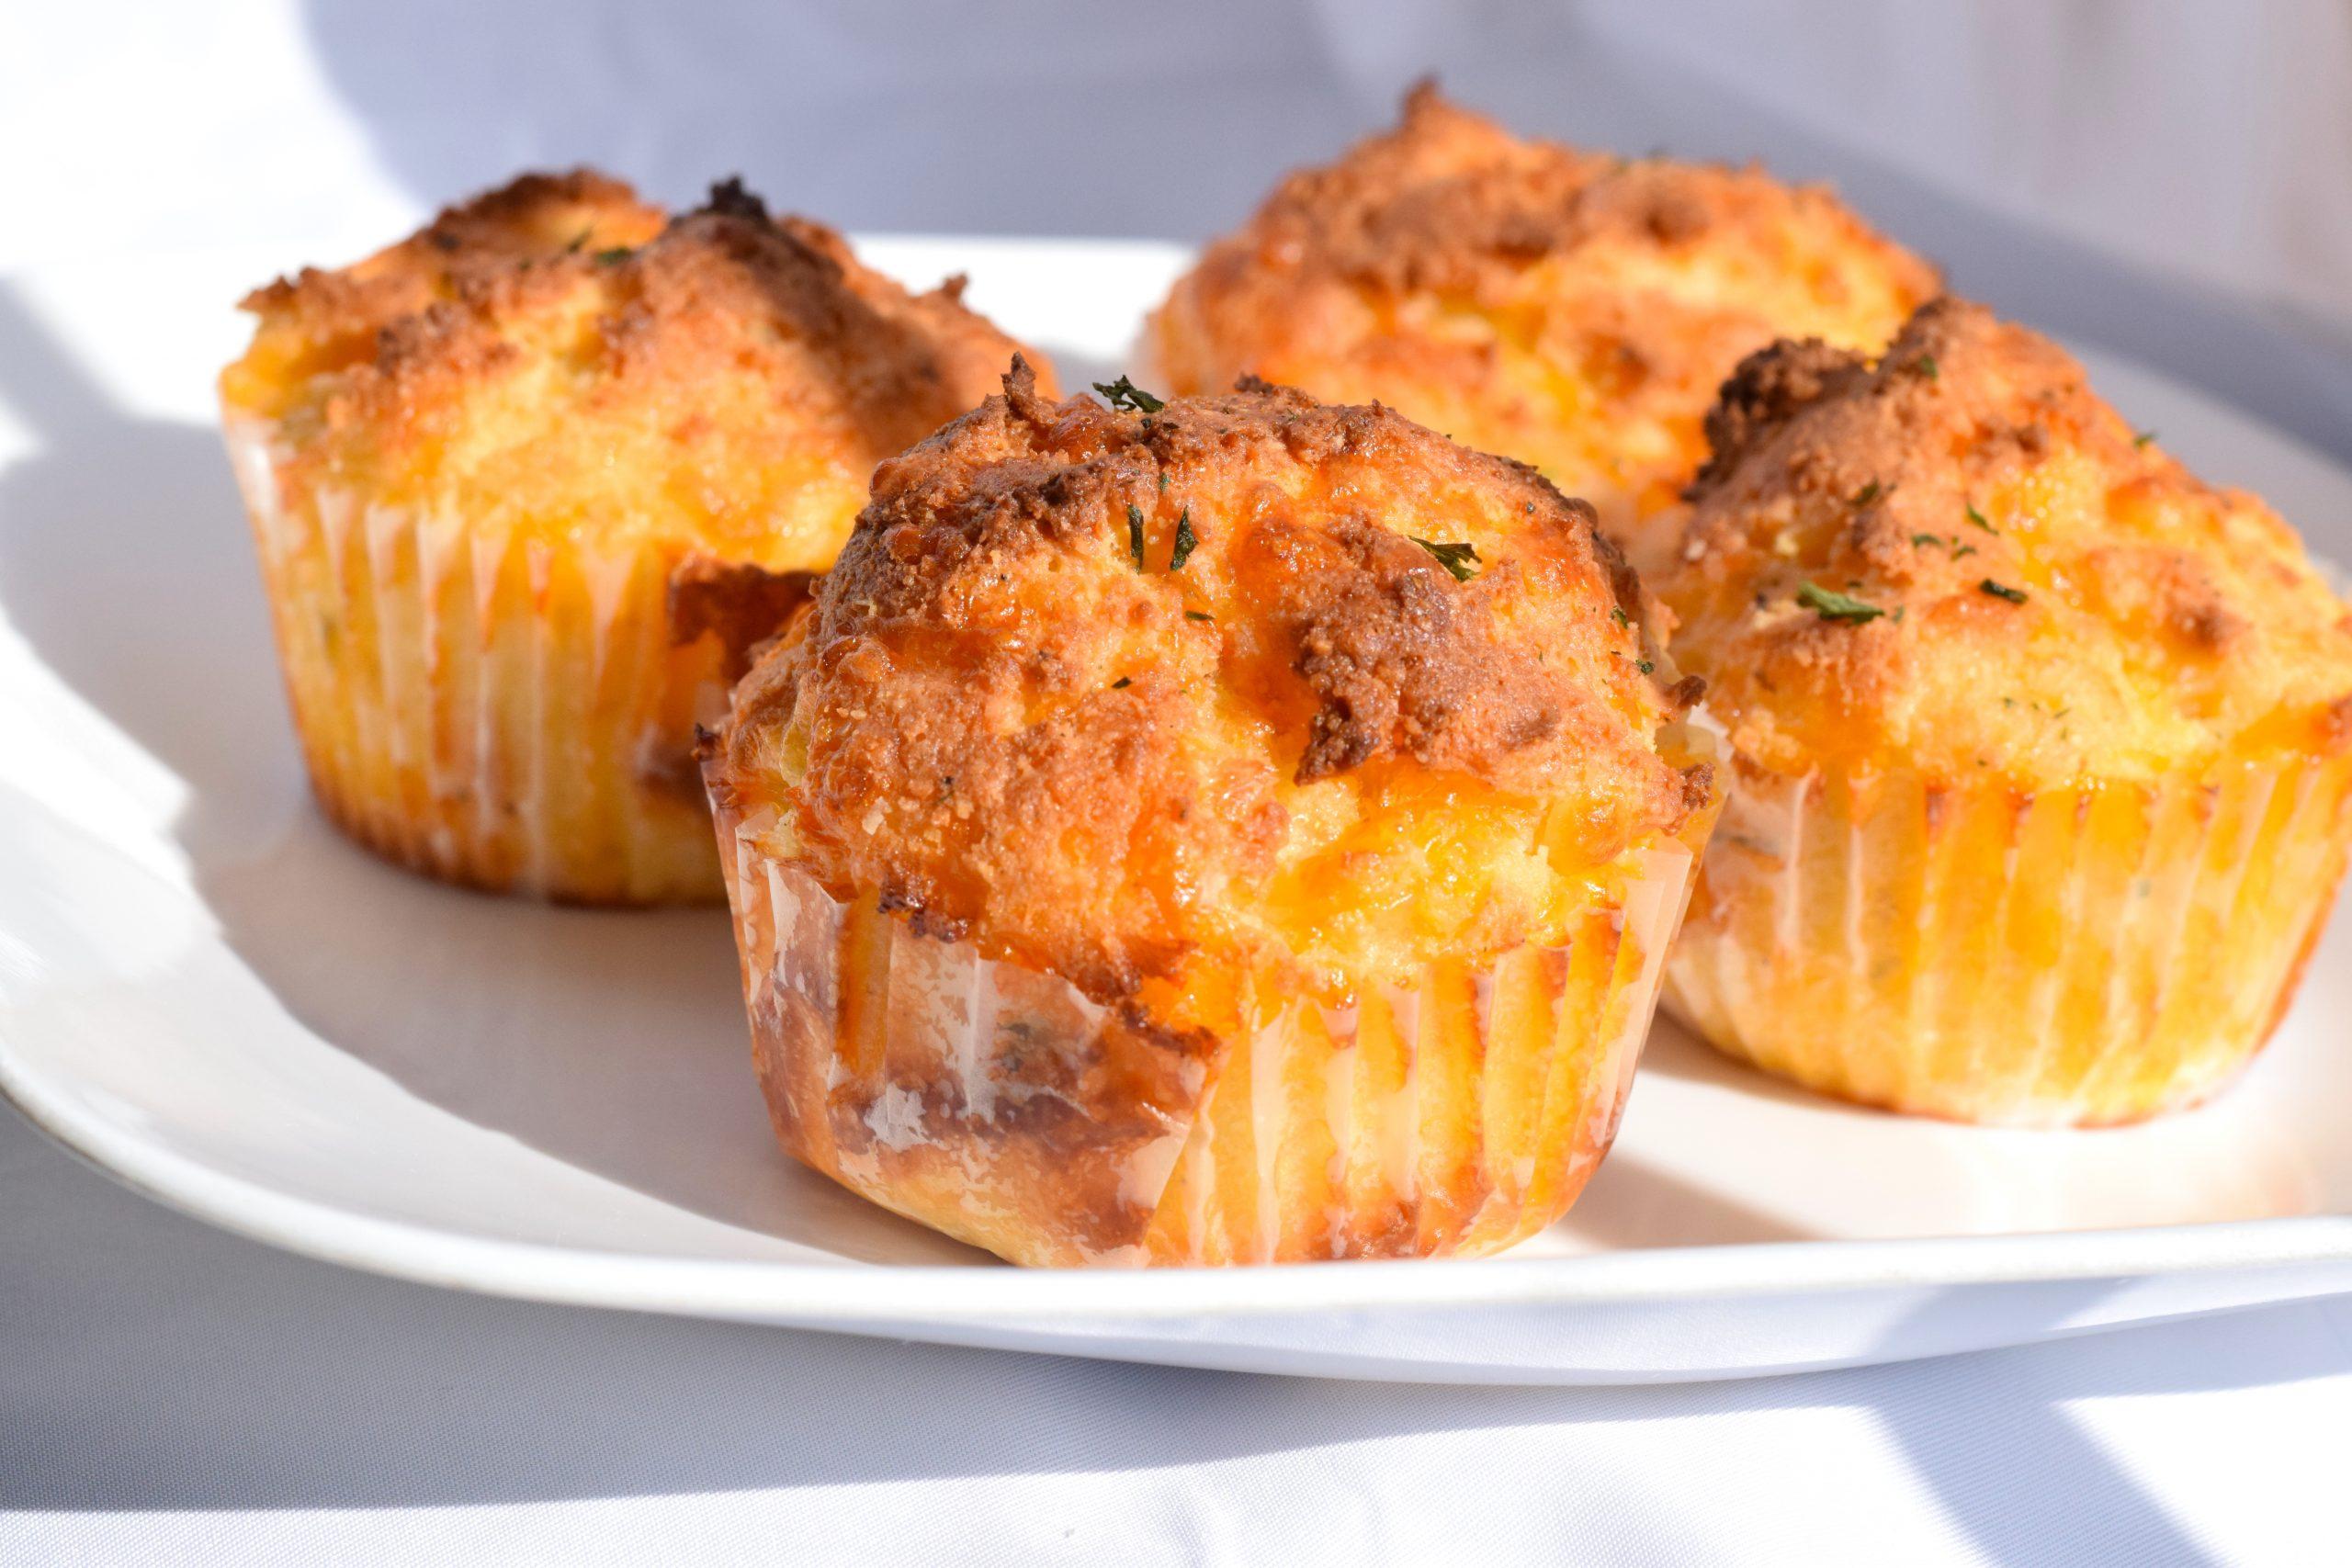 Keto Cheddar Cheese Muffins